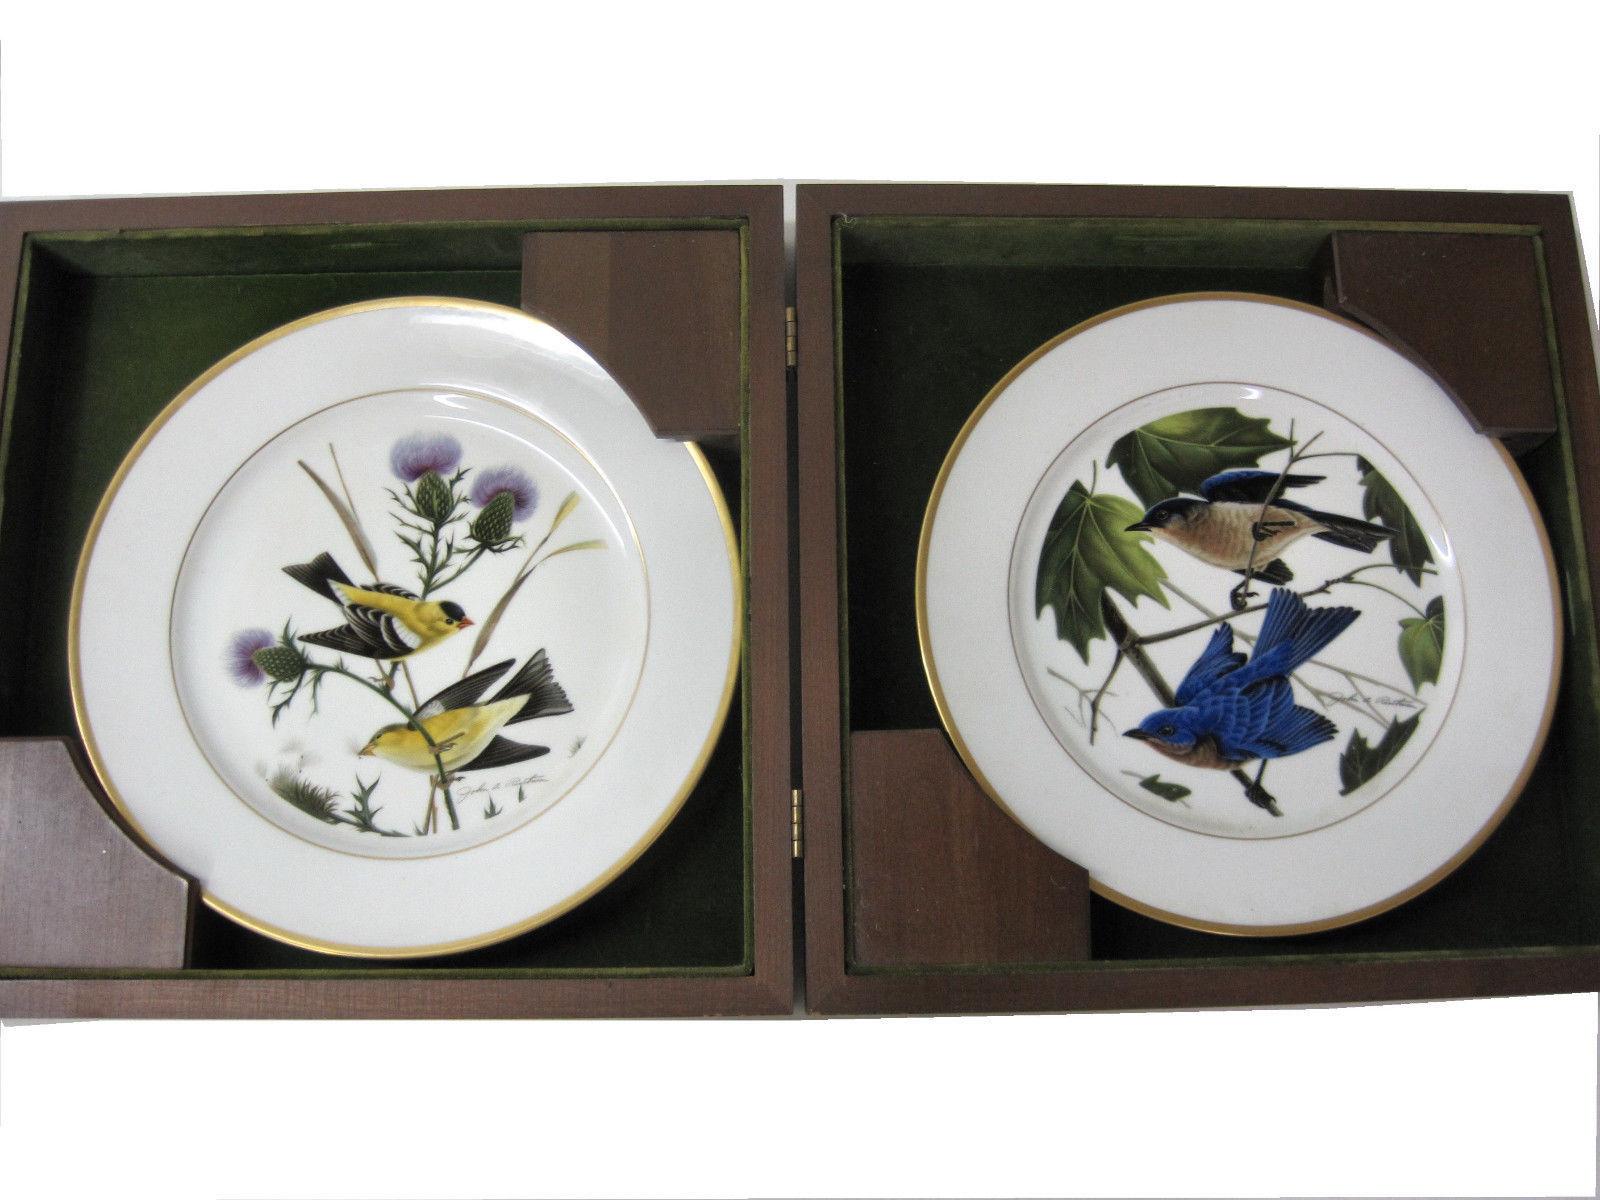 Hutschenreuther Collector Plates Gold Finch Bluebird Ruthven Artist Boxed Set - $89.95  sc 1 st  Bonanza & Hutschenreuther Plates: 19 listings